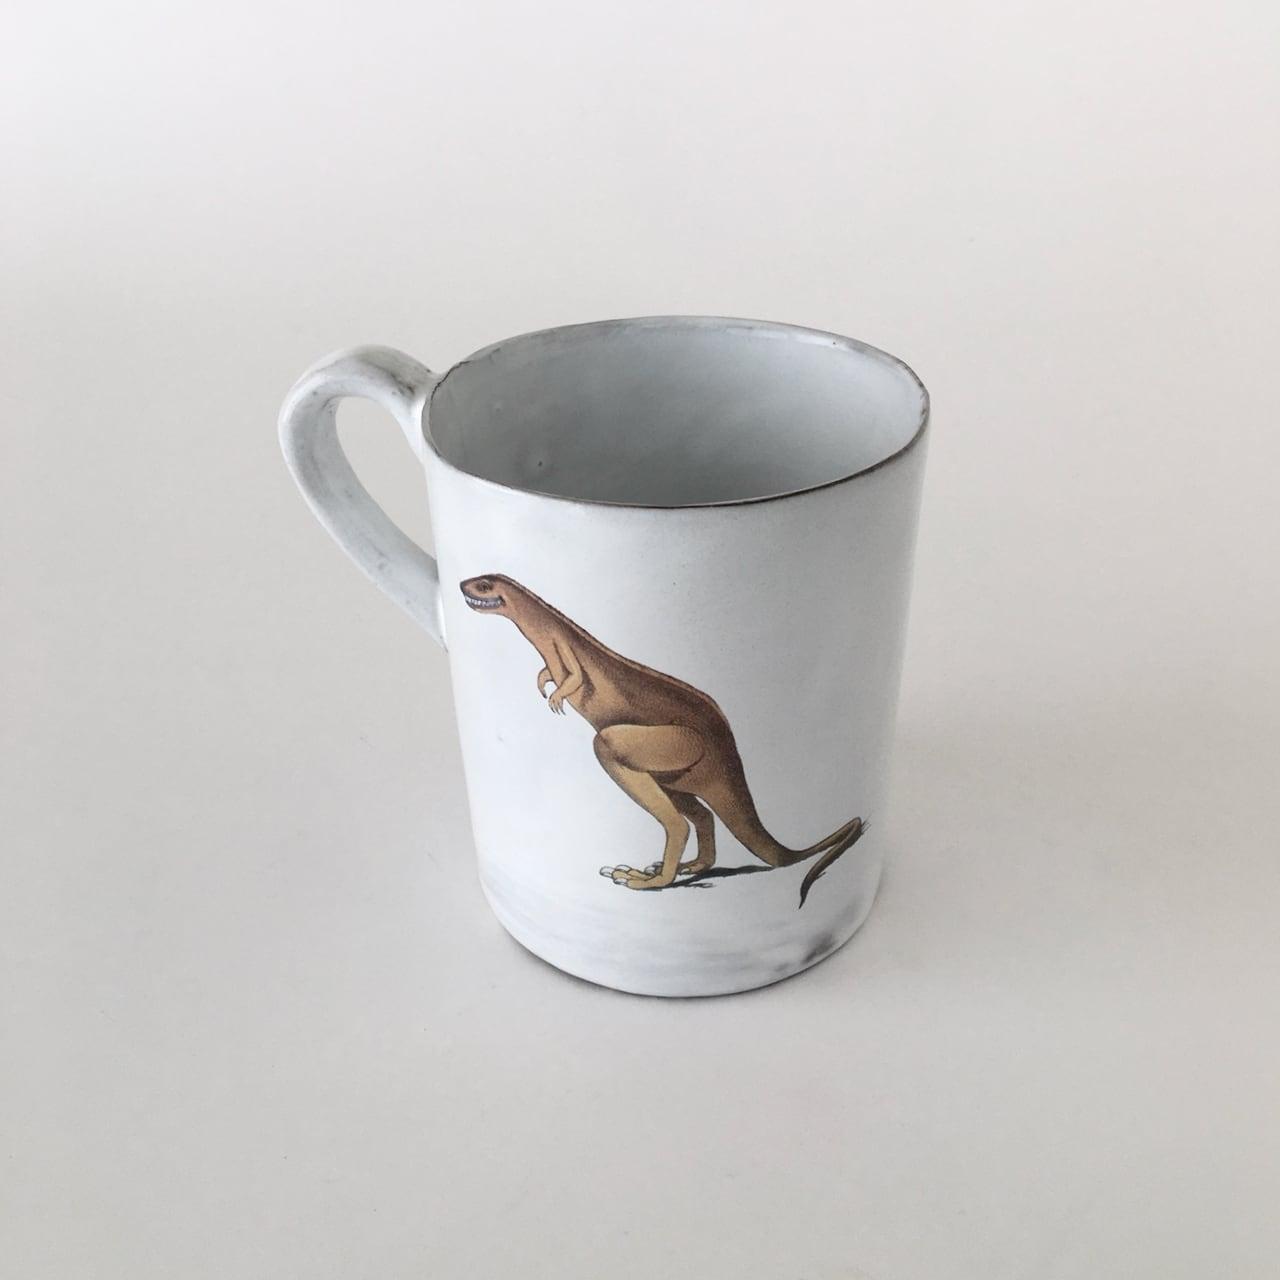 Carron Illustrated Mug Dino|マグカップ Dino